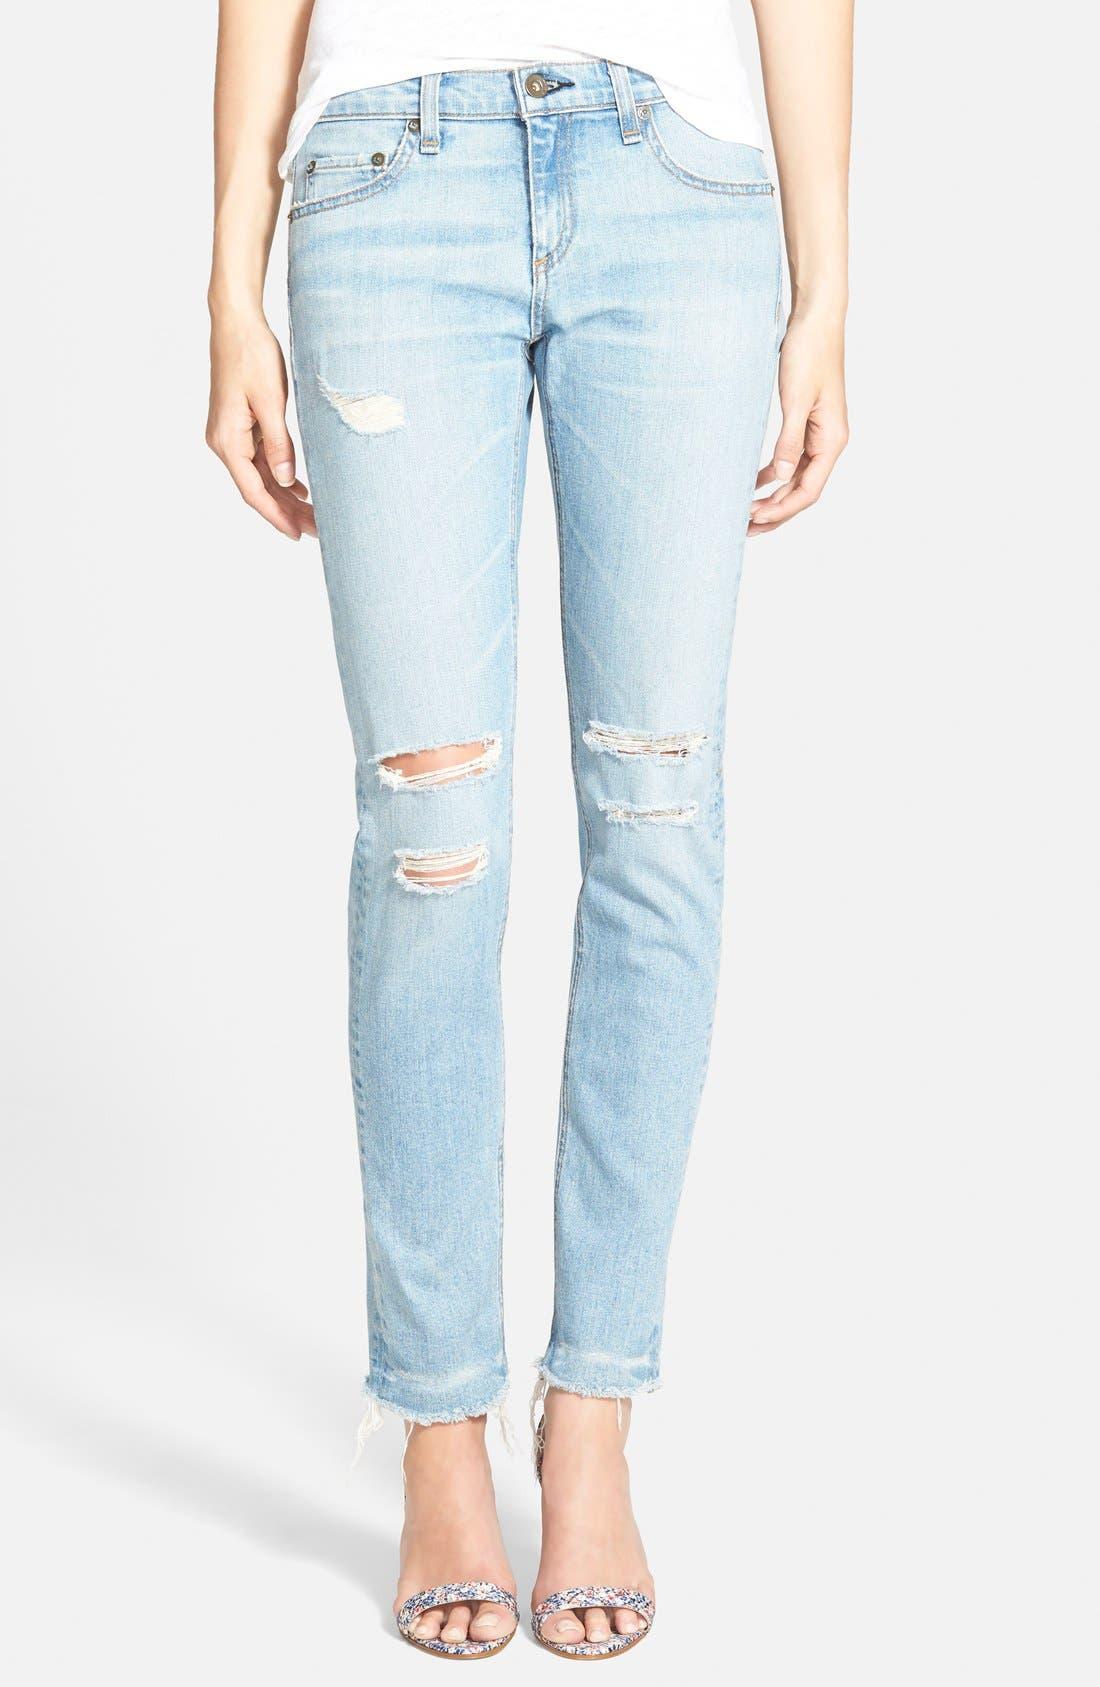 Alternate Image 1 Selected - rag & bone/JEAN 'Dre' Distressed Ankle Jeans (Abingdon)